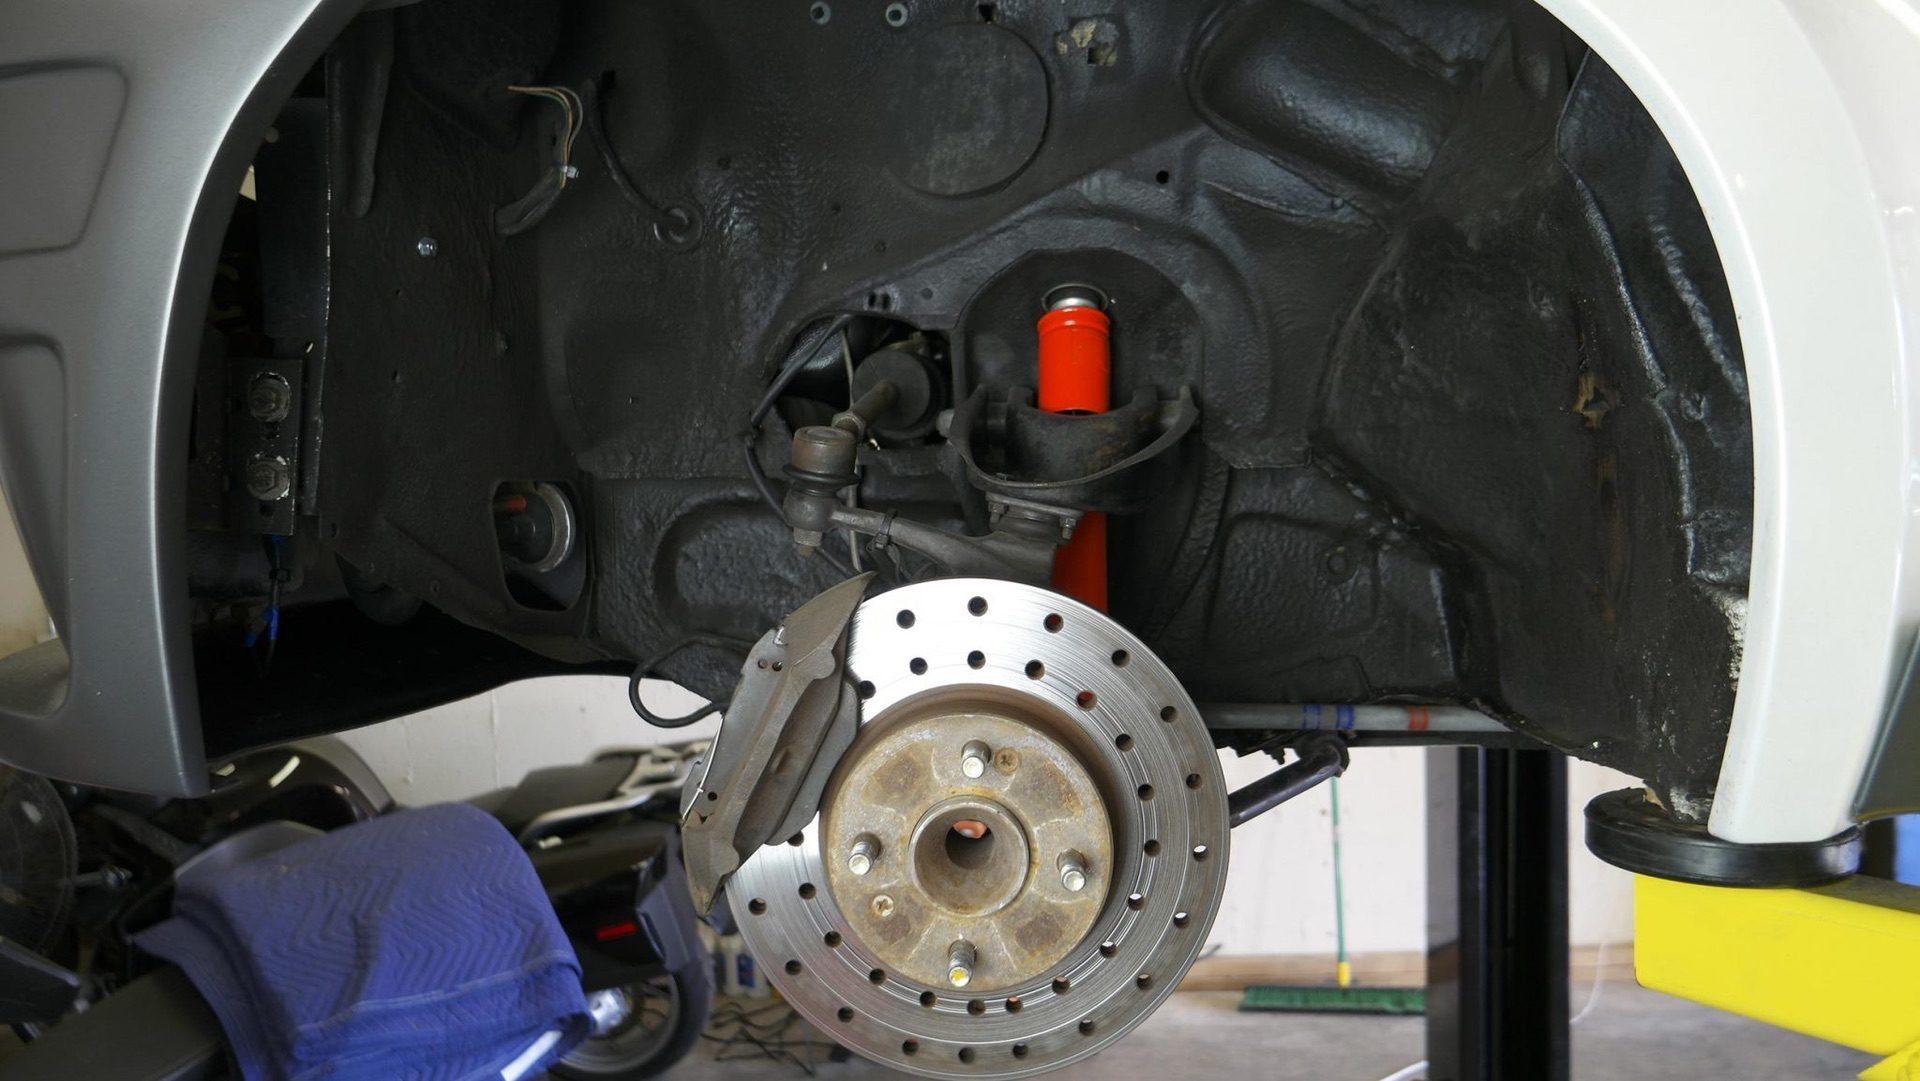 1985_Renault_R5_Turbo_2_rotary-0007